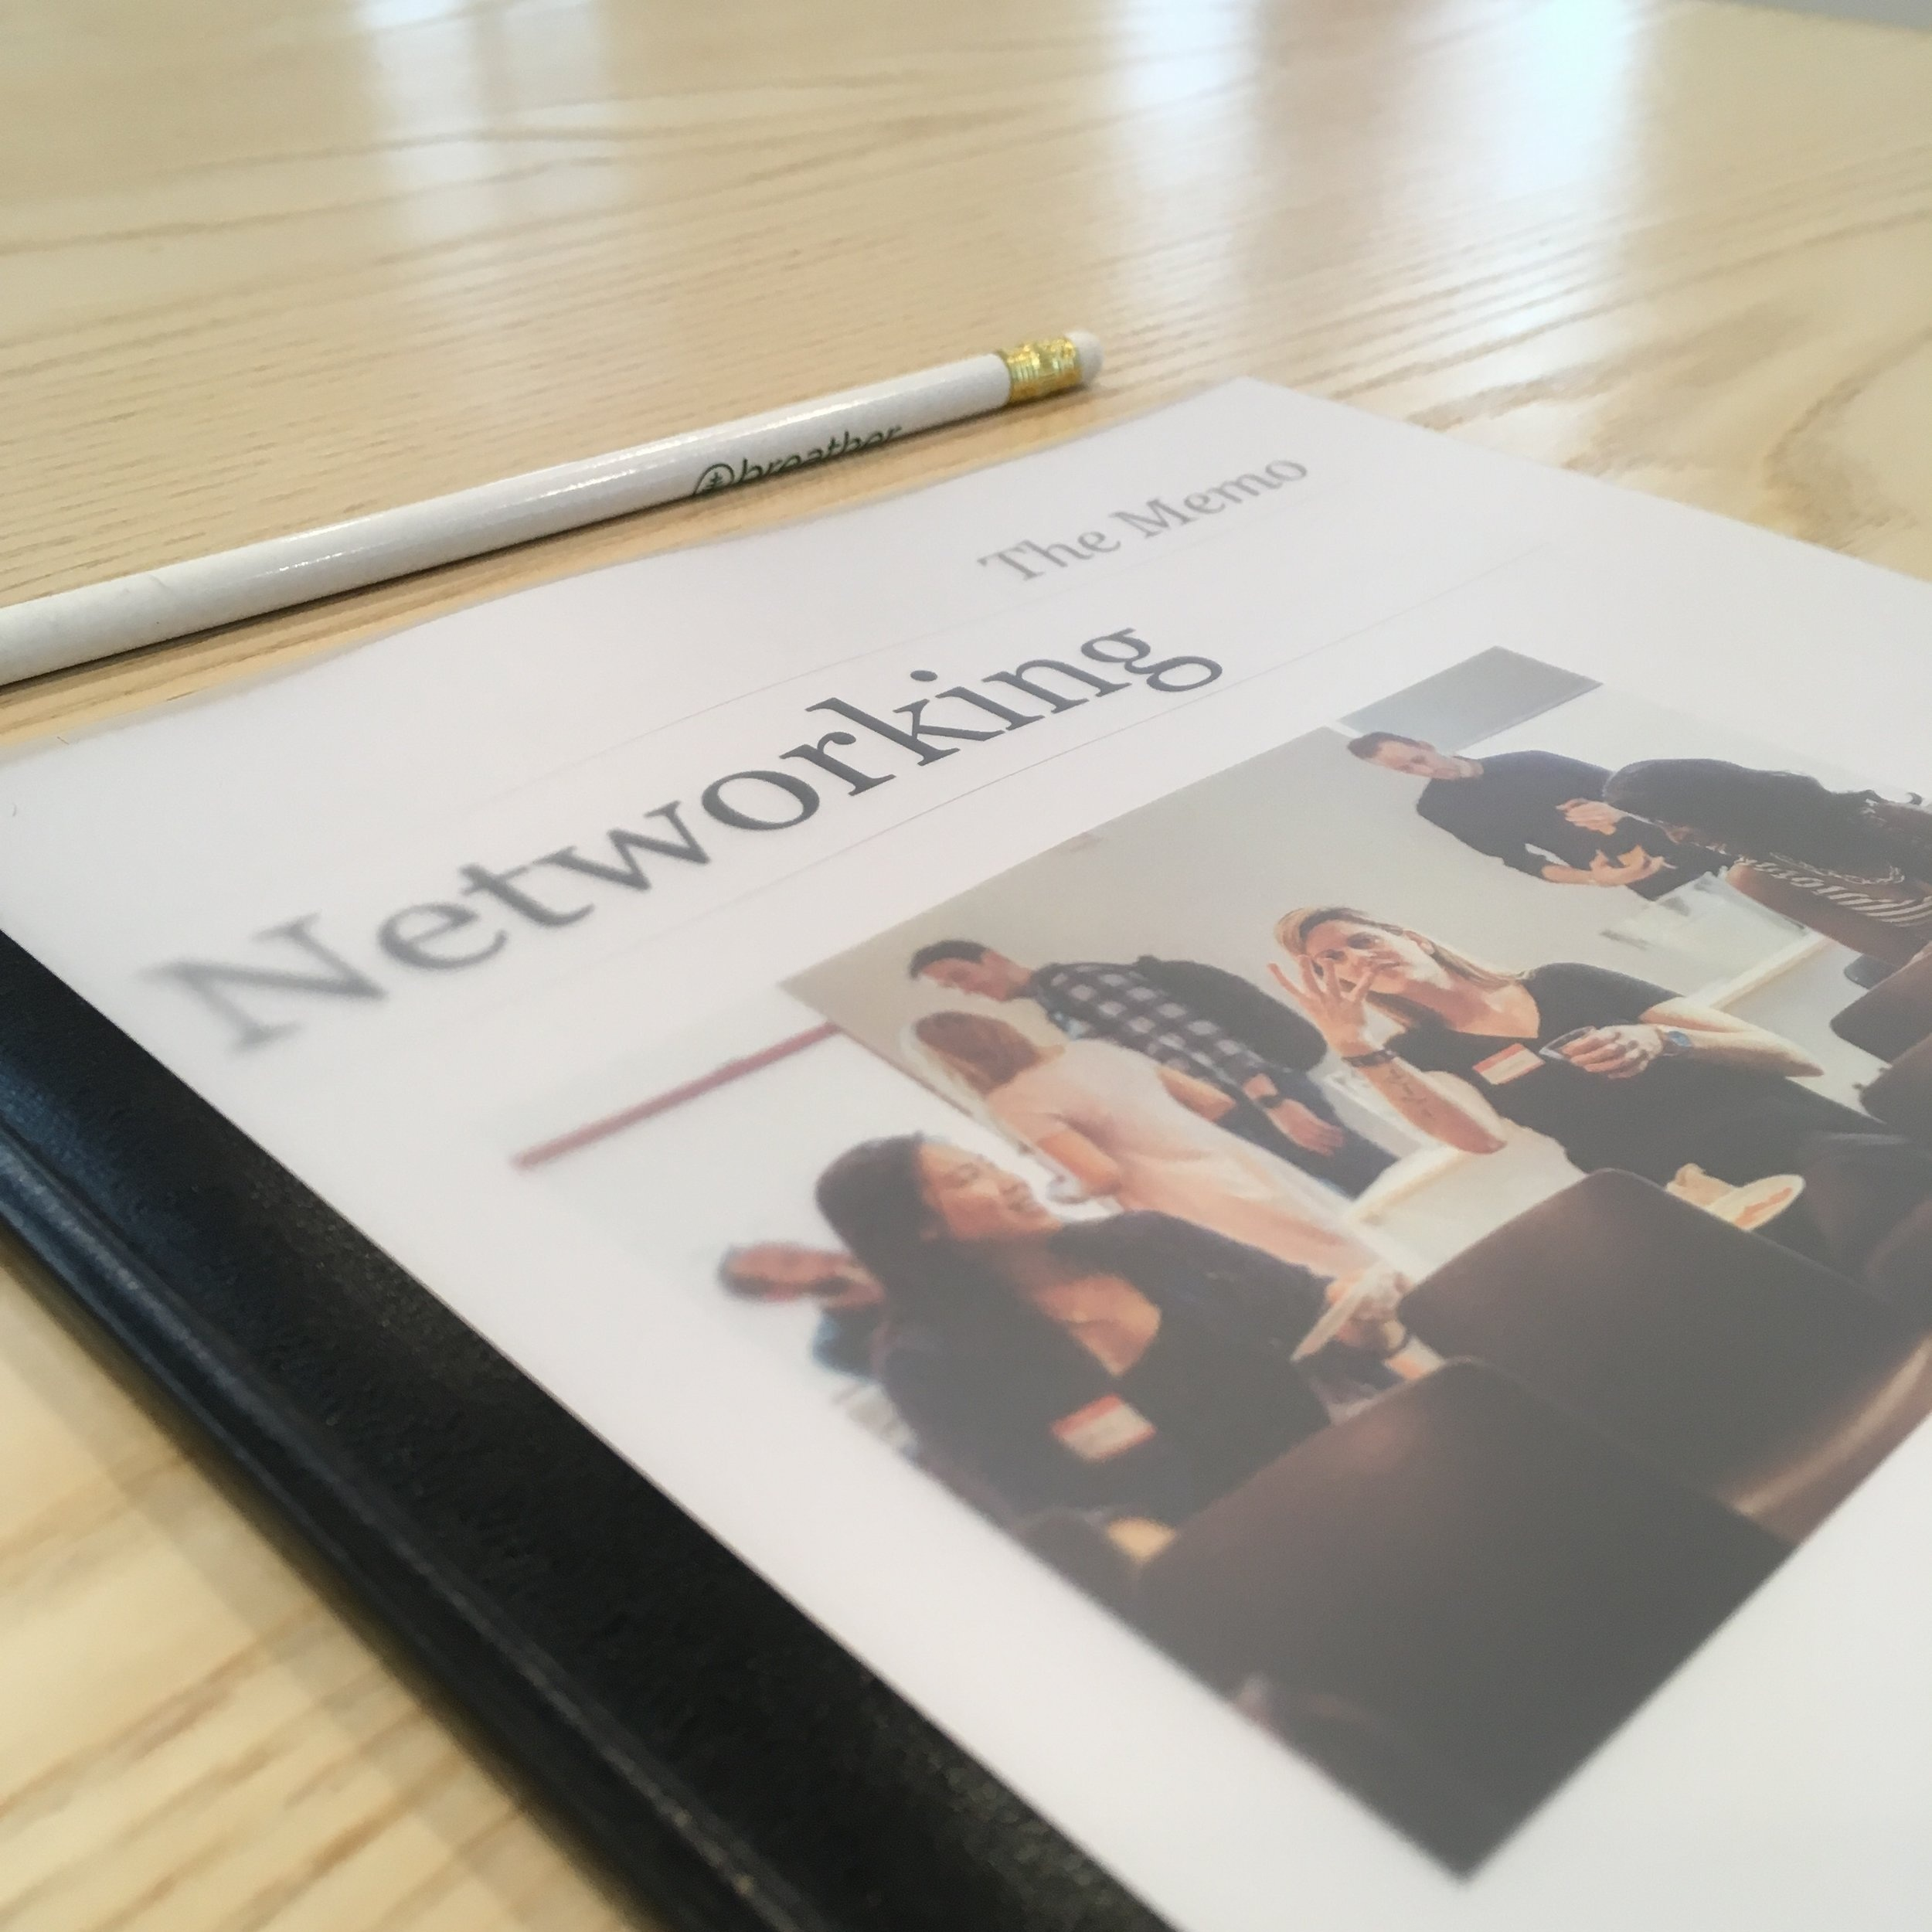 networking_curriculum_workbook.jpg